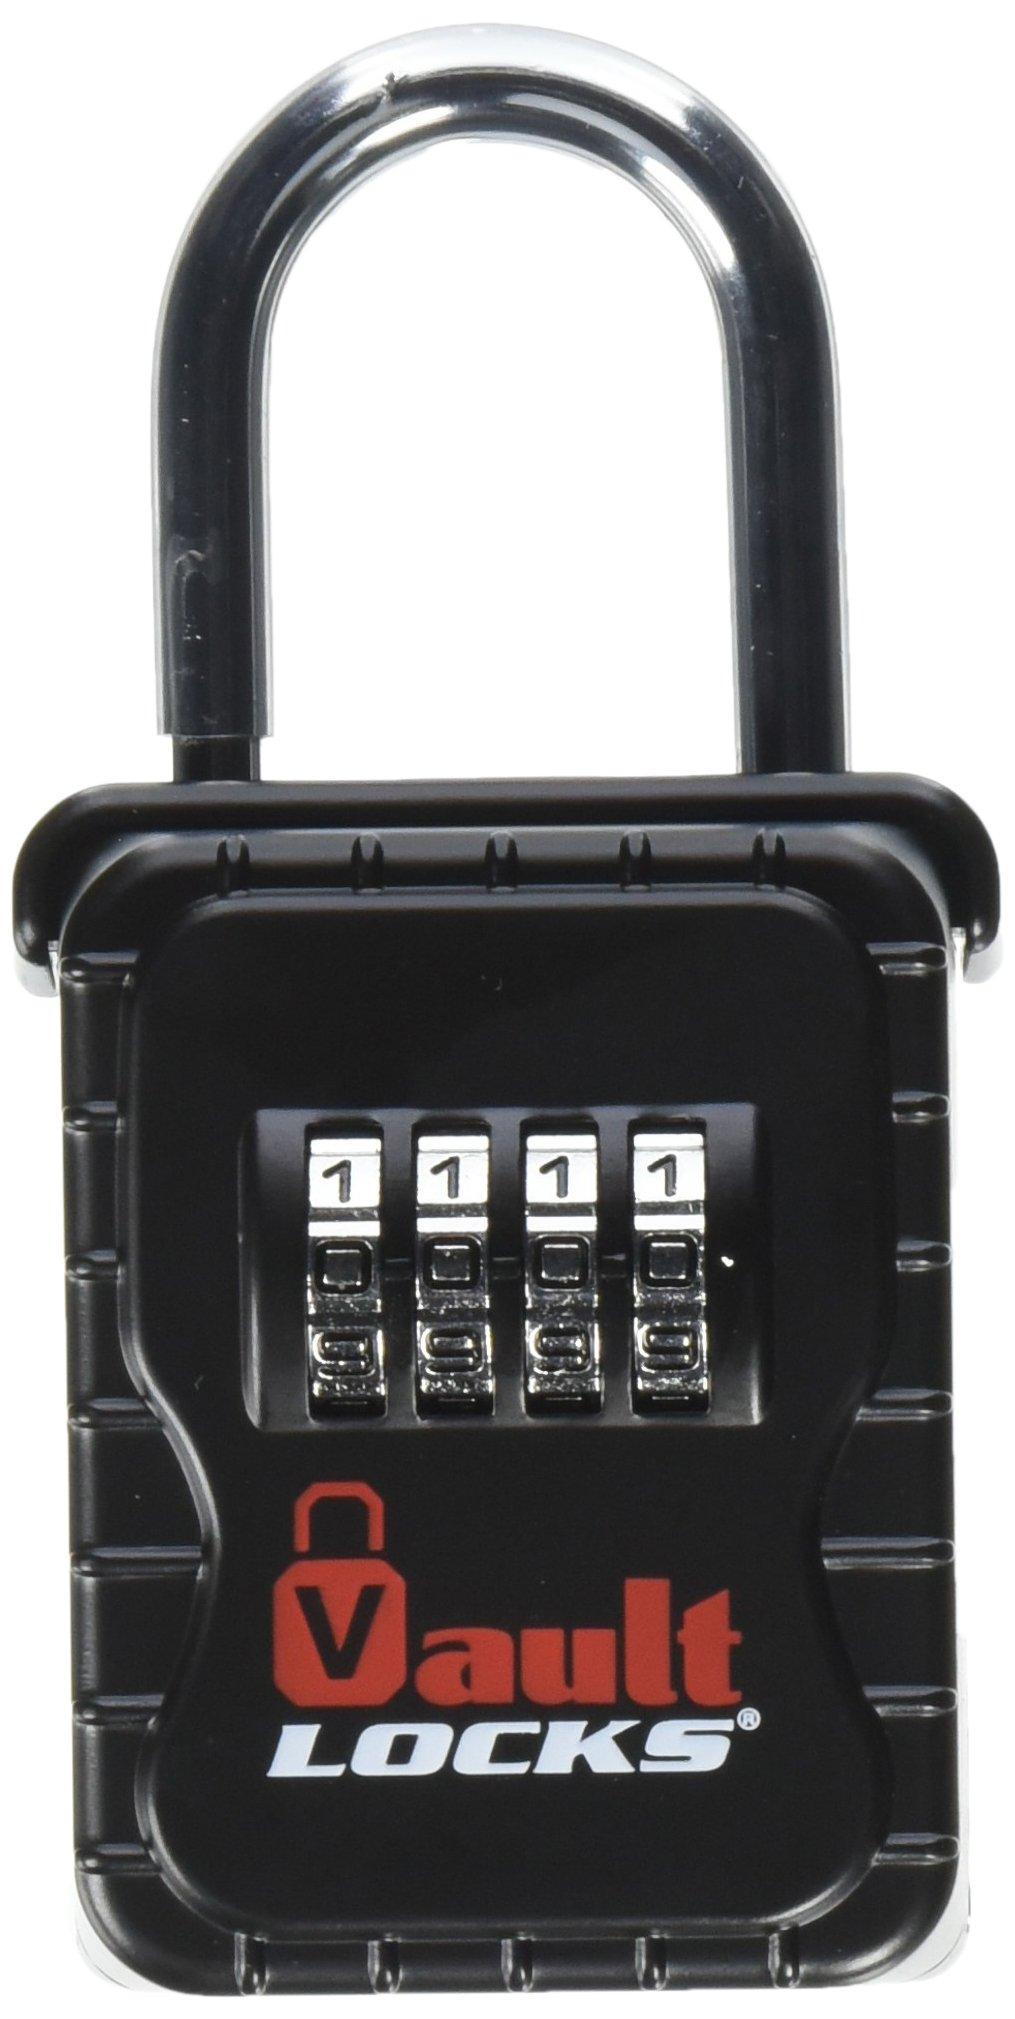 Vault Locks 3200 Key Storage Lock Box with Set Your Own Combination